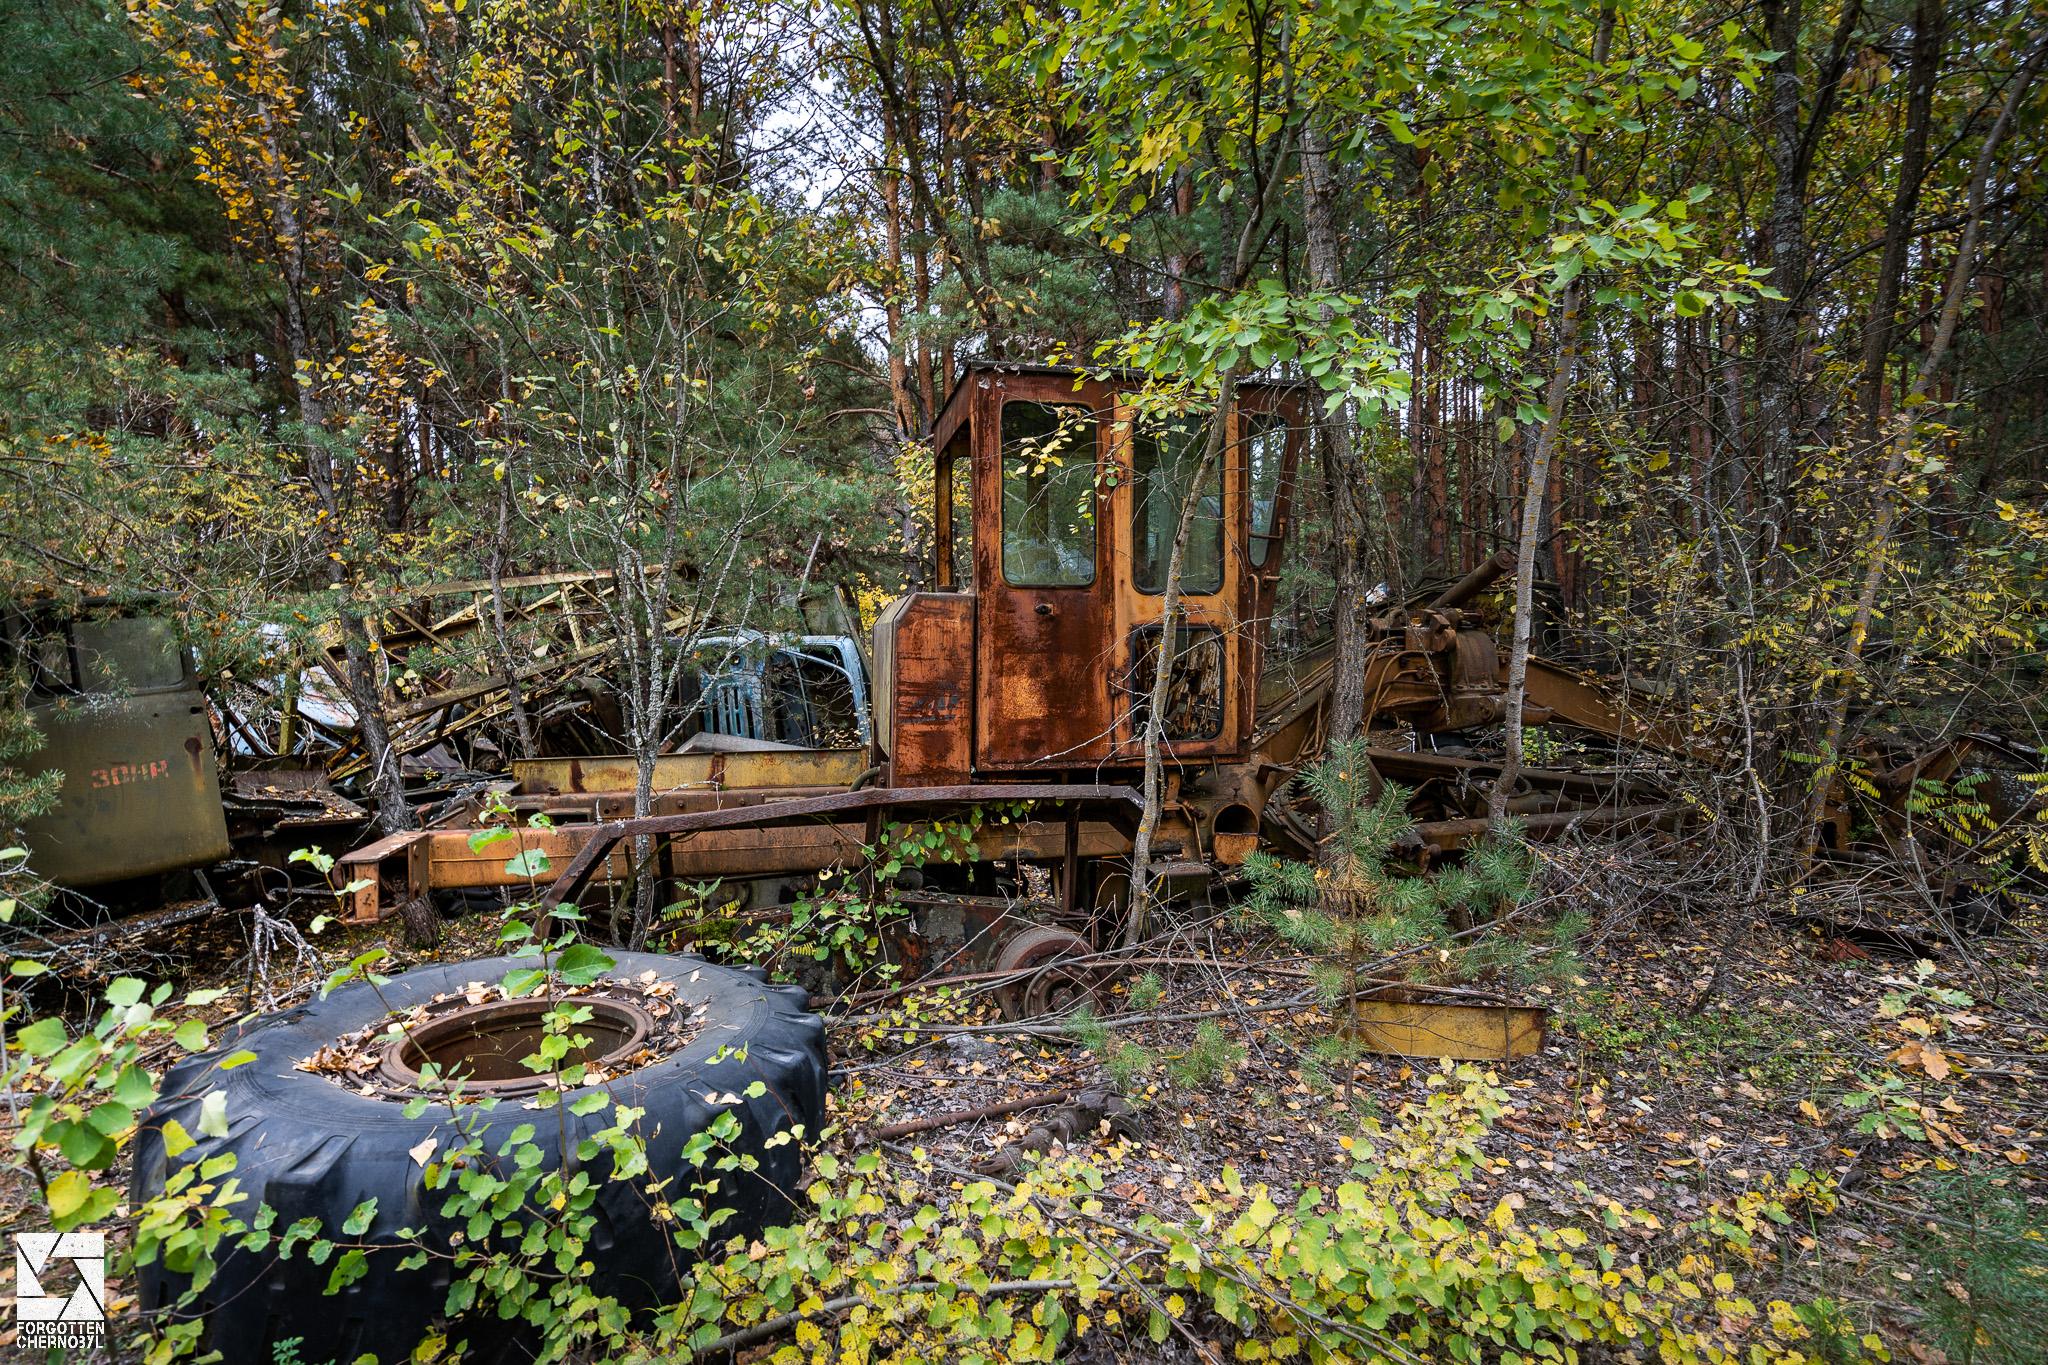 ATH 2 garage and repair facility near Pripyat